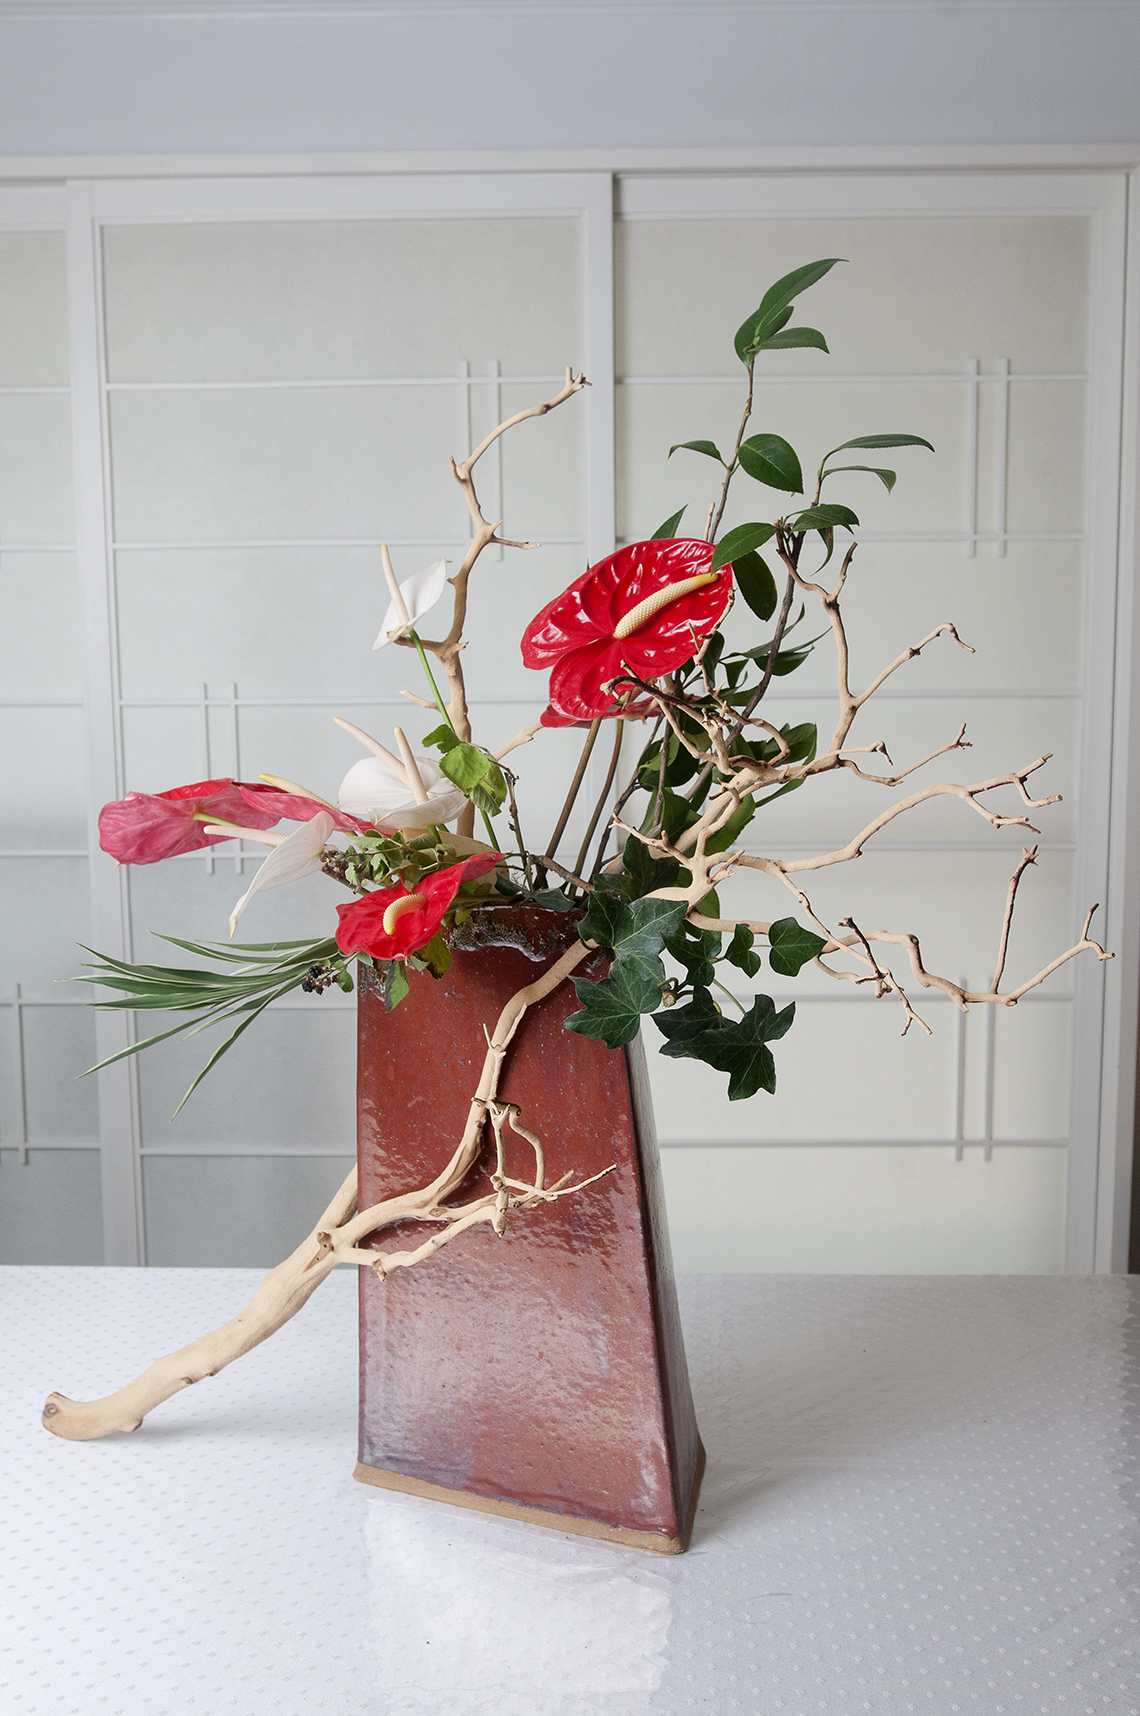 Ruby Maruyama Practices Japanese Flower Arranging